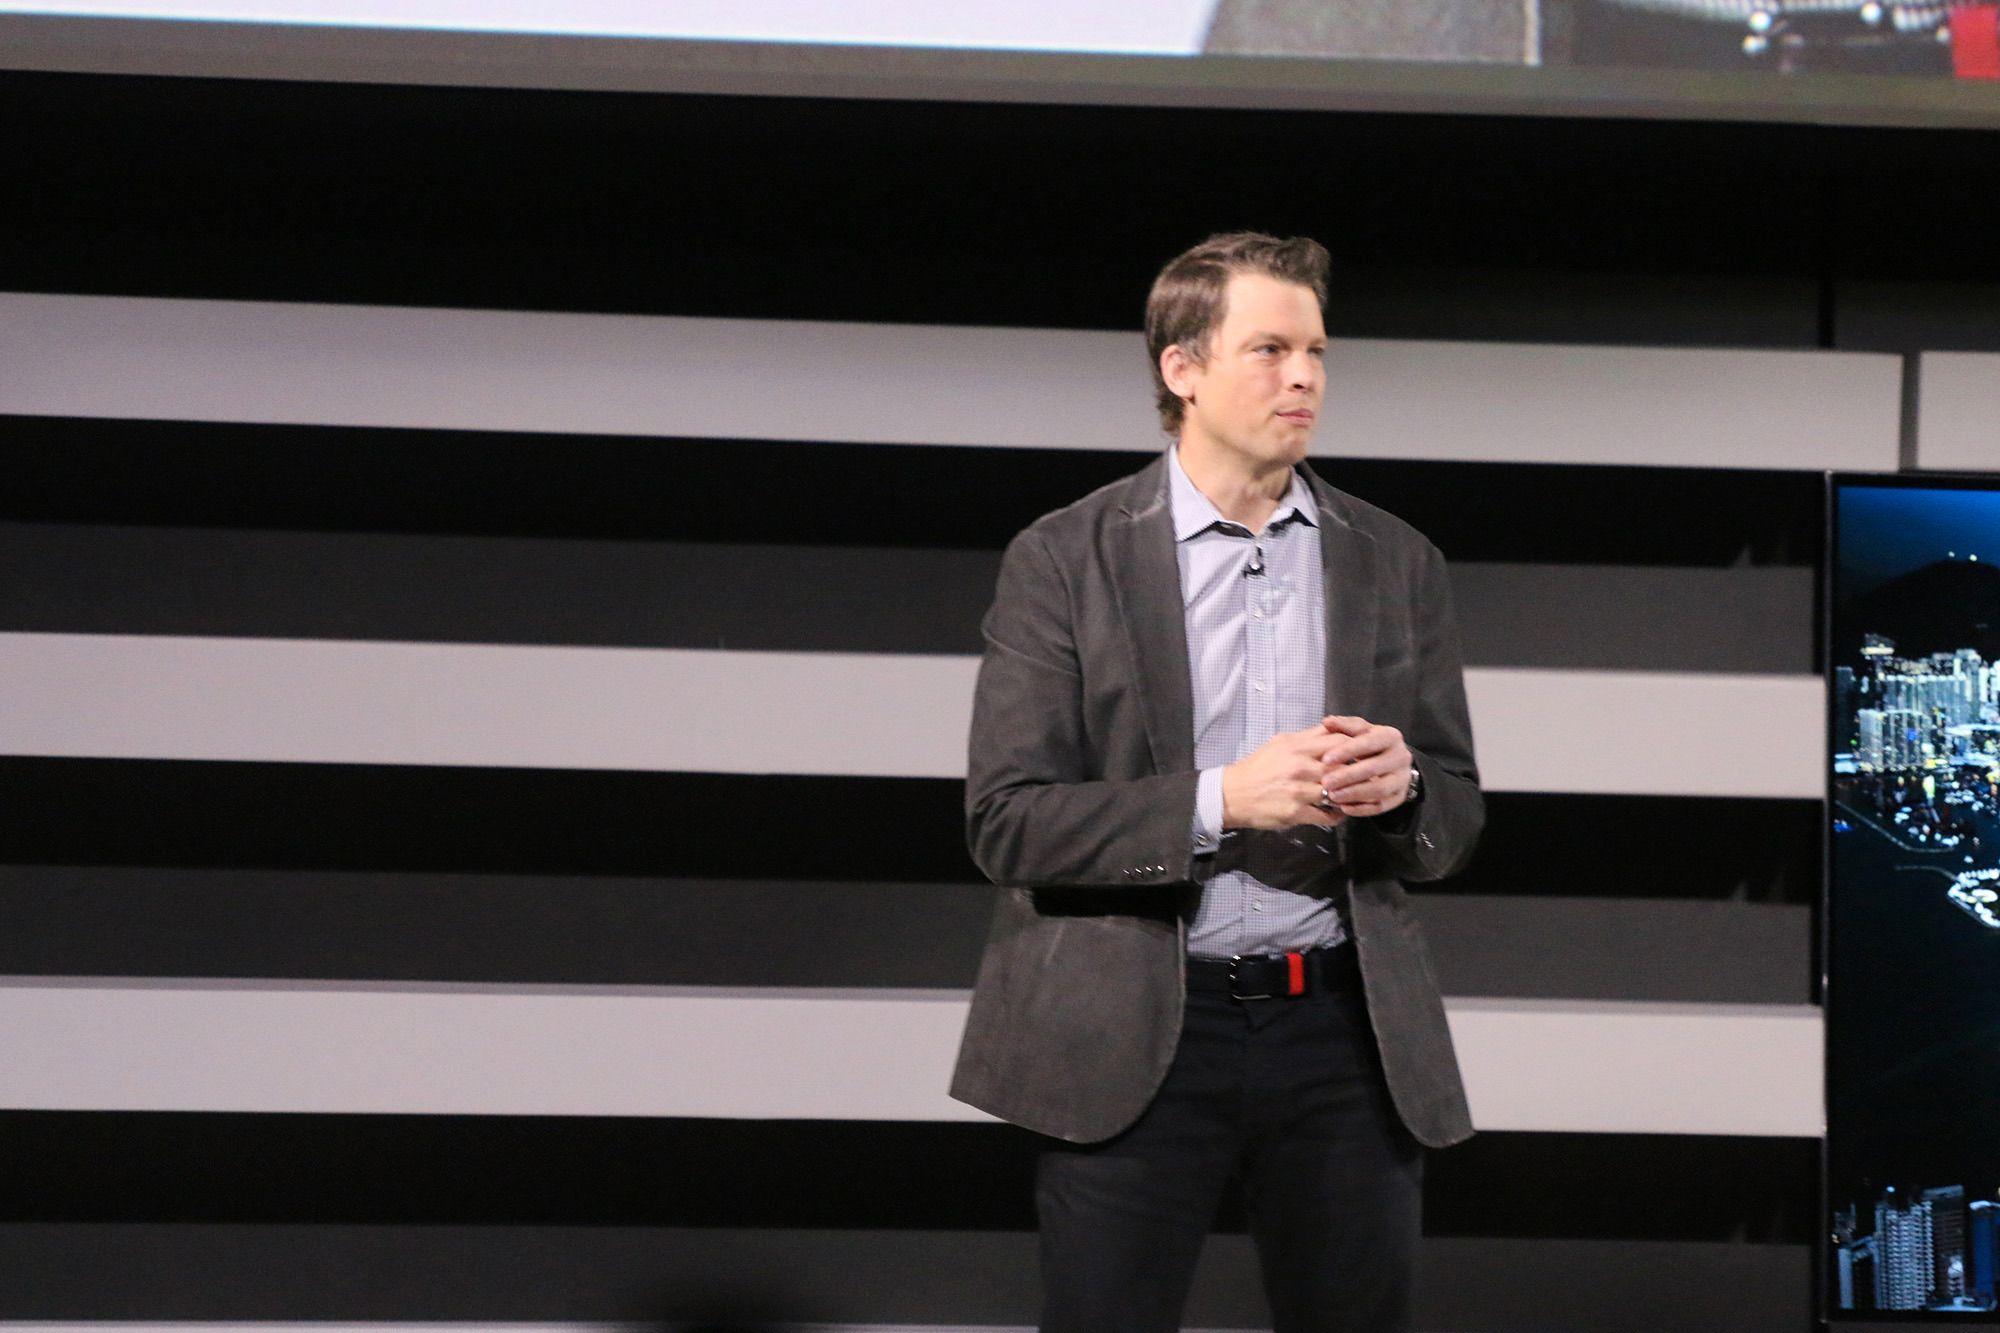 Greg Peters, sjef for strømming og partnerskap i Netflix.Foto: Finn Jarle Kvalheim, Tek.no